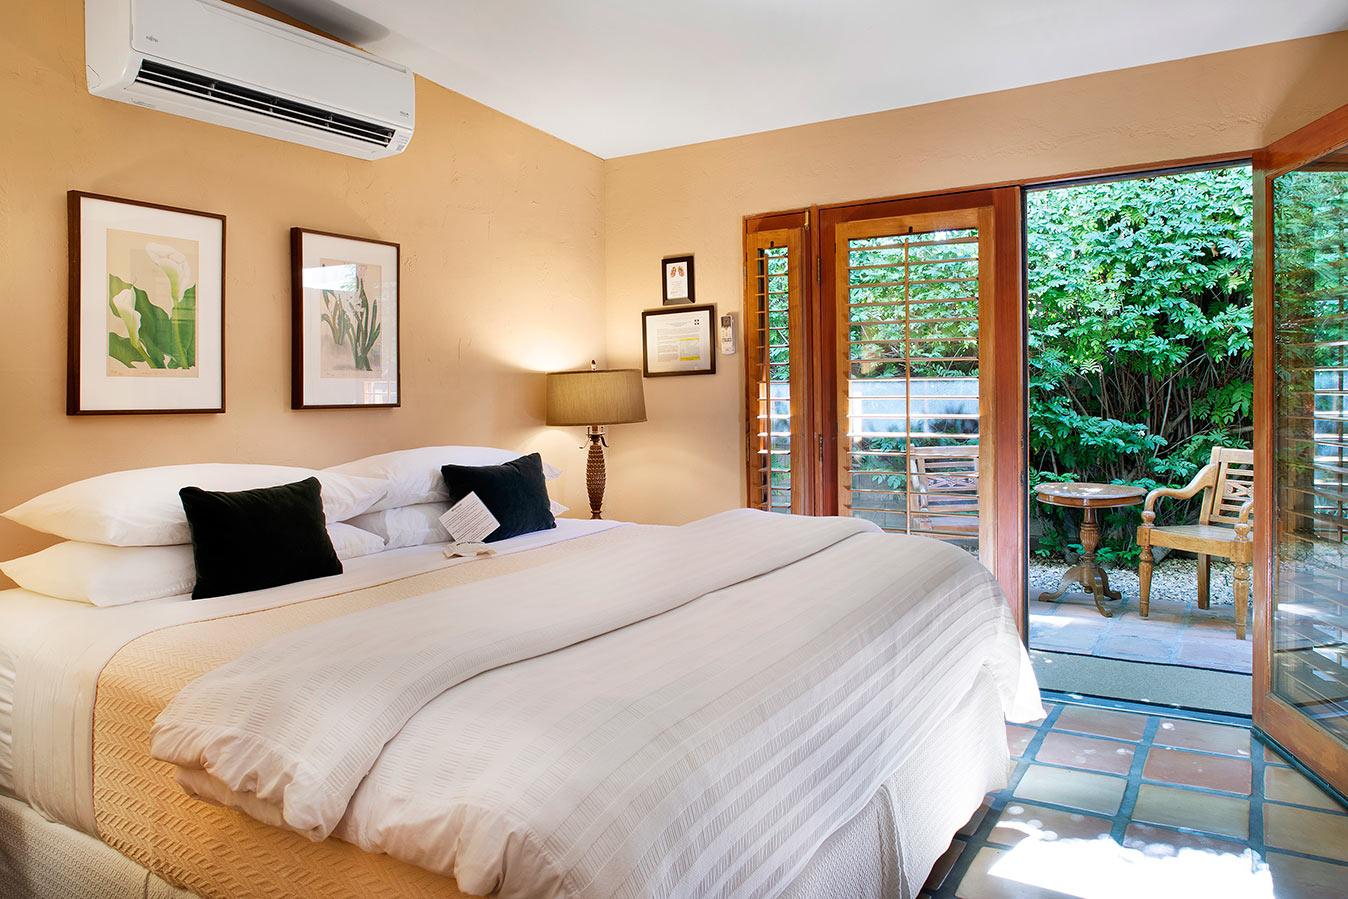 Patio Room Bedroom at The Hacienda in Gay Palm Springs